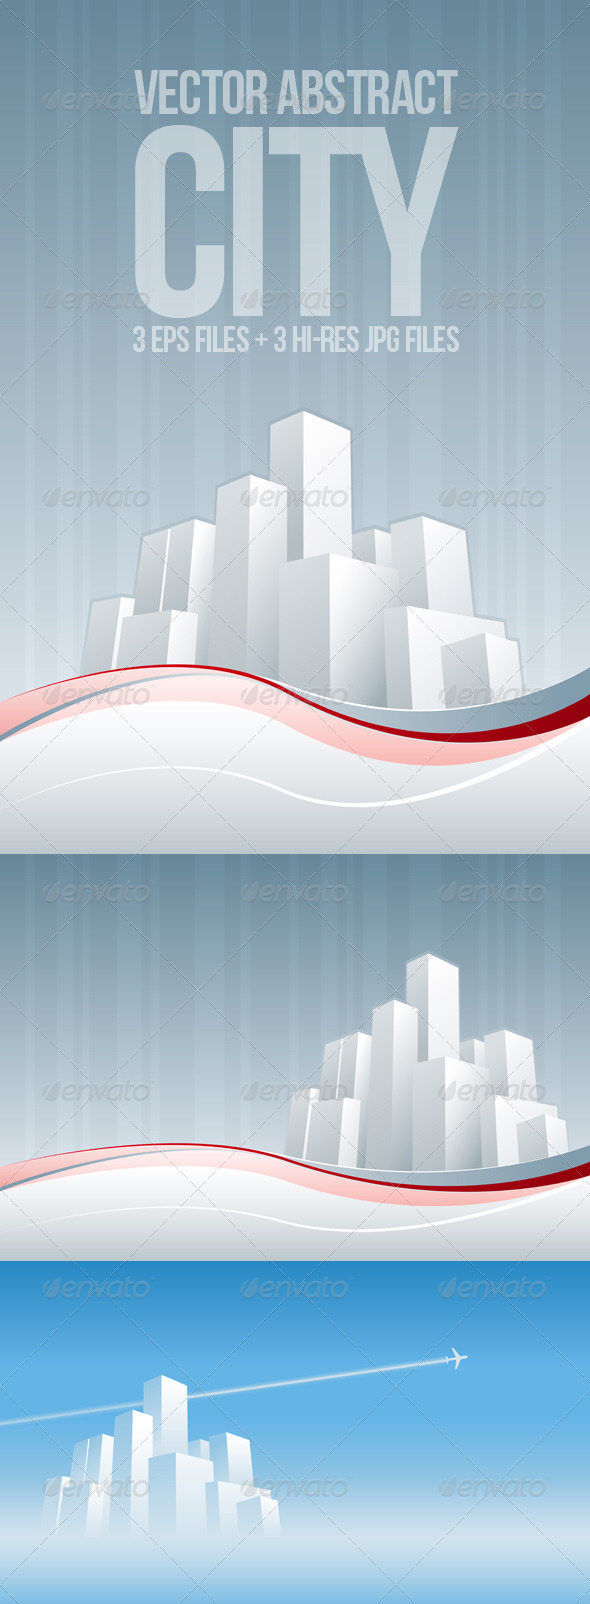 City - Miscellaneous Conceptual